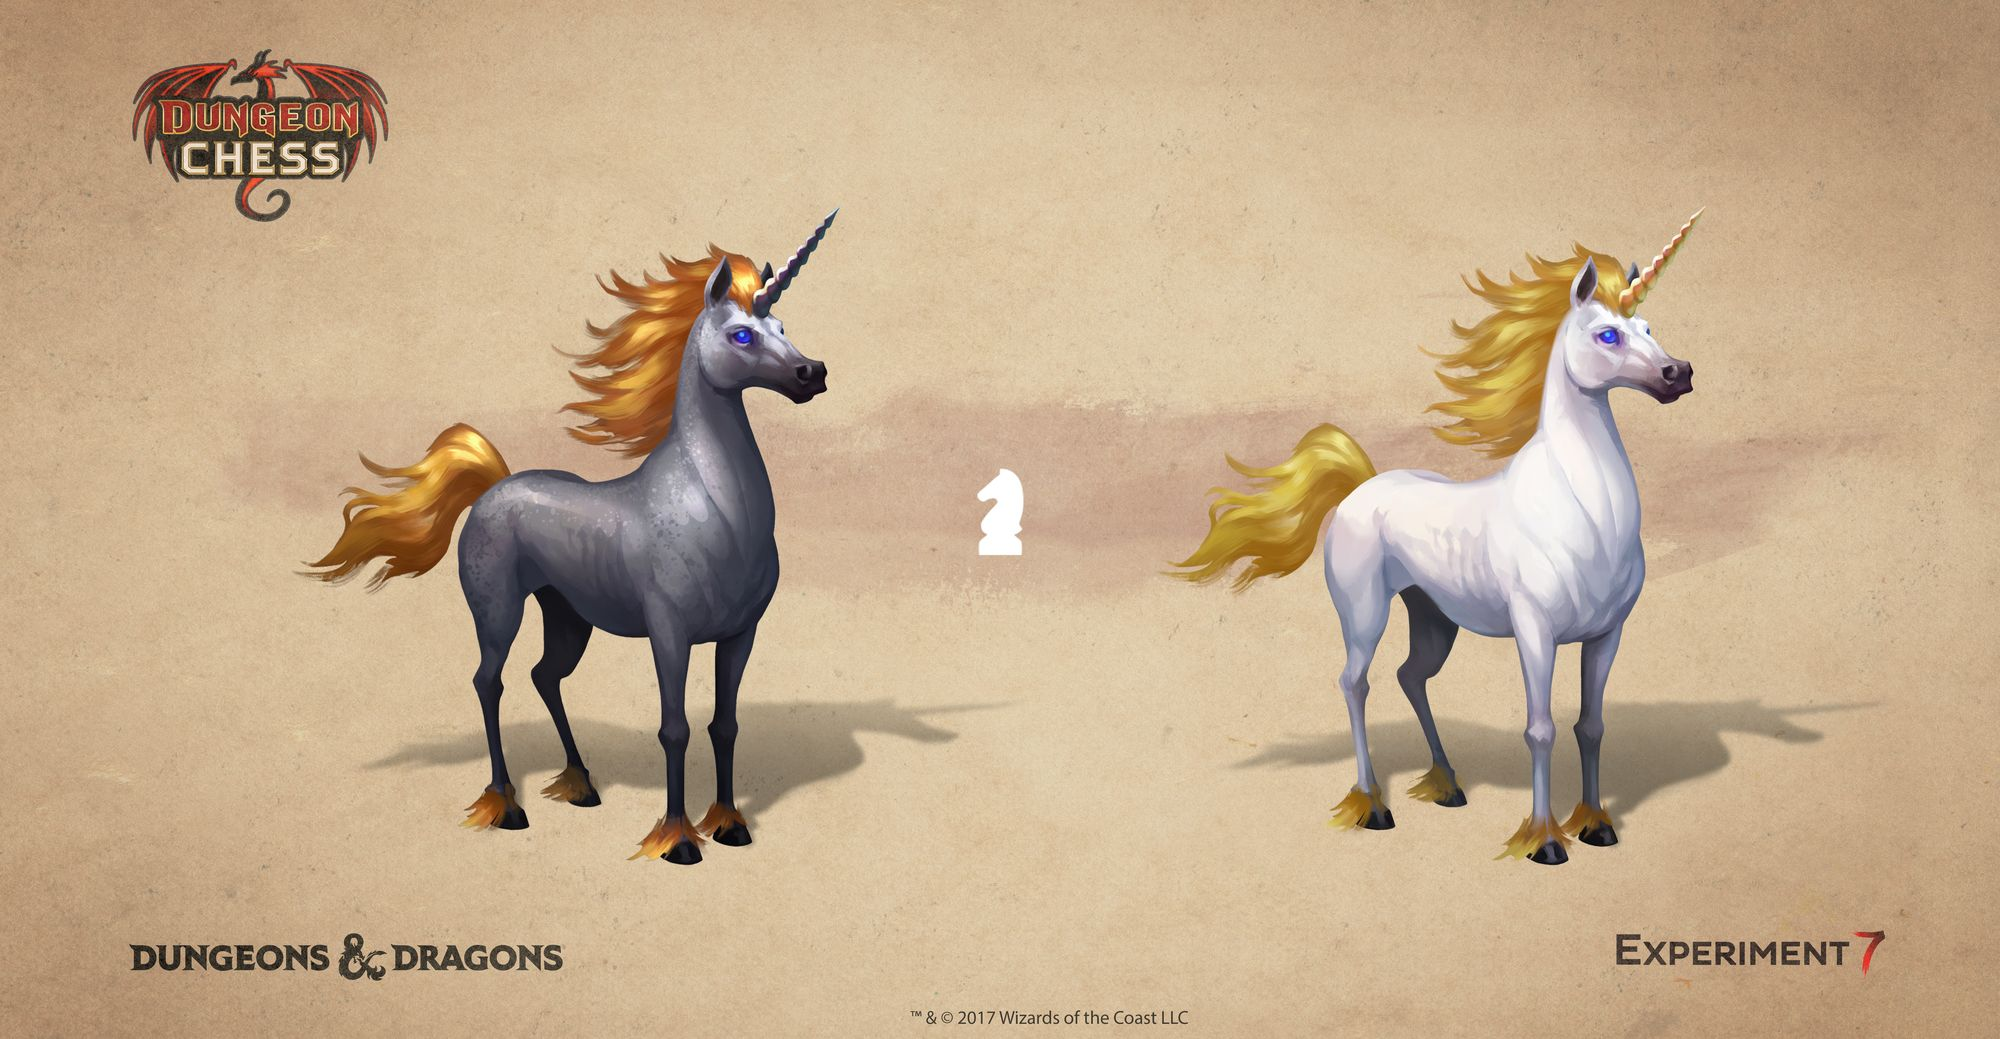 DungeonChess_Unicorn_small.jpg